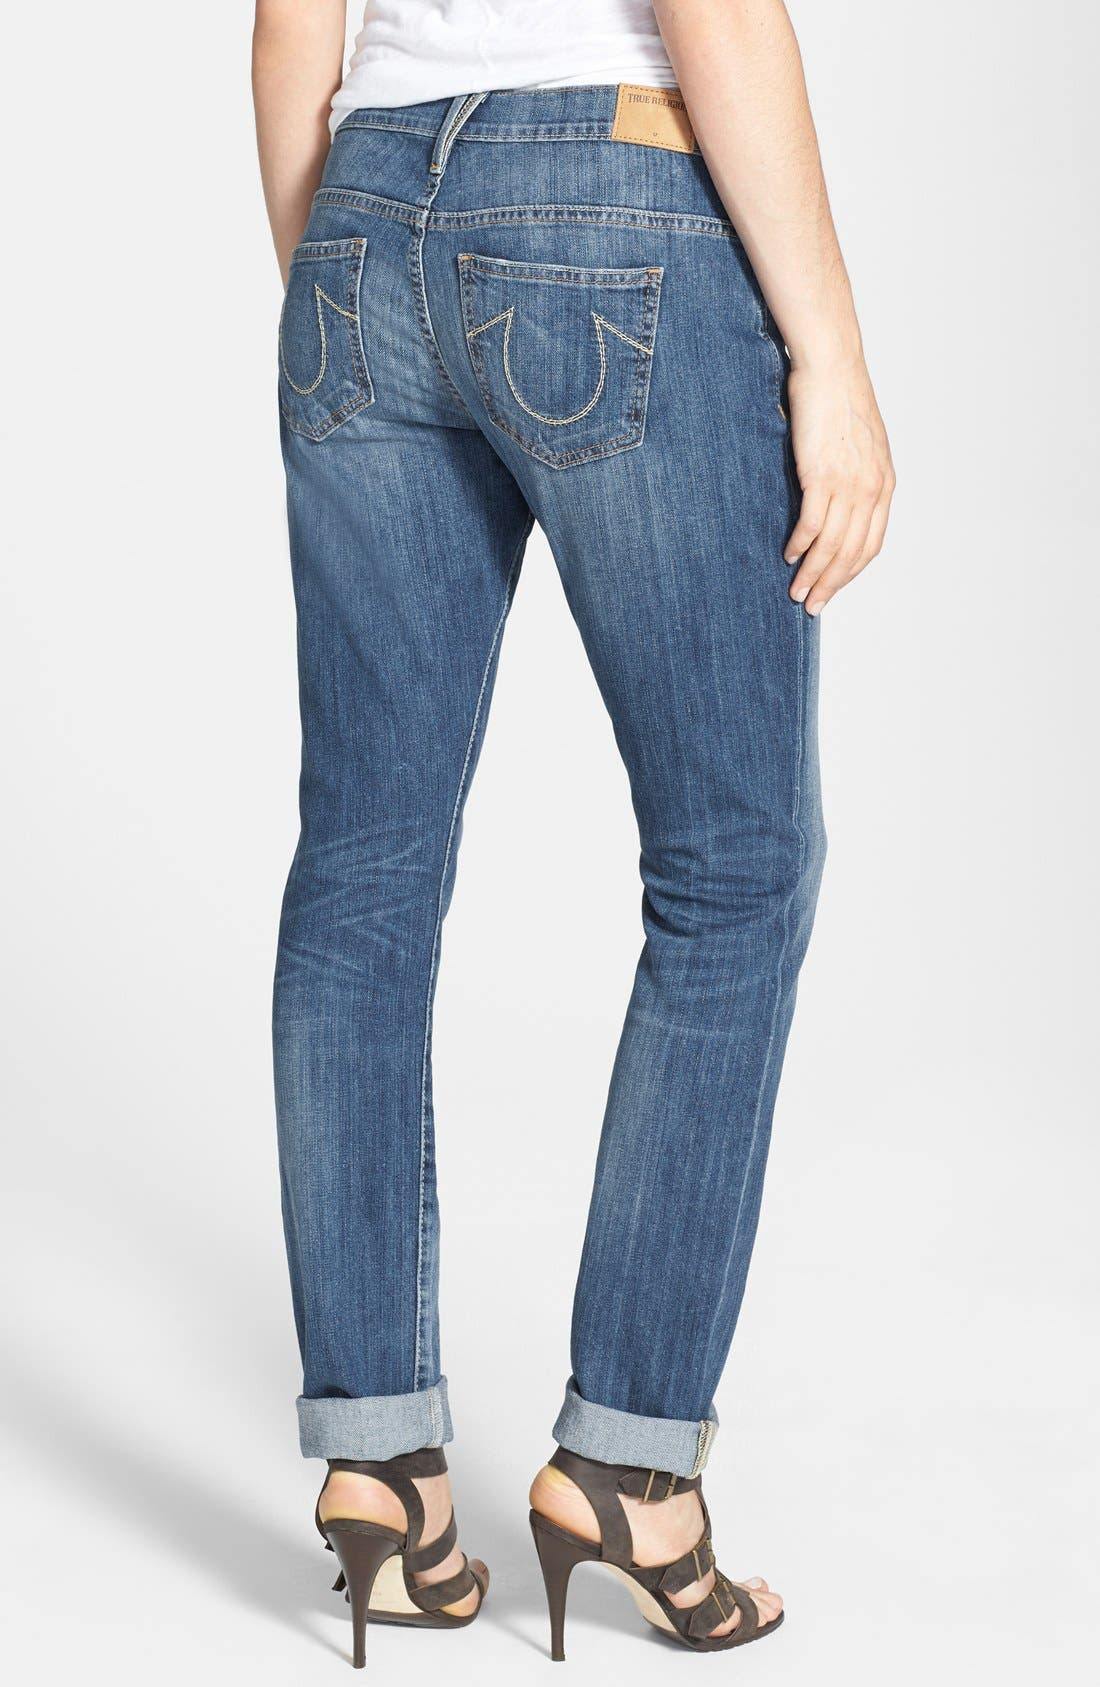 Alternate Image 2  - True Religion Brand Jeans 'Audrey' Boyfriend Jeans (Spring Ink)